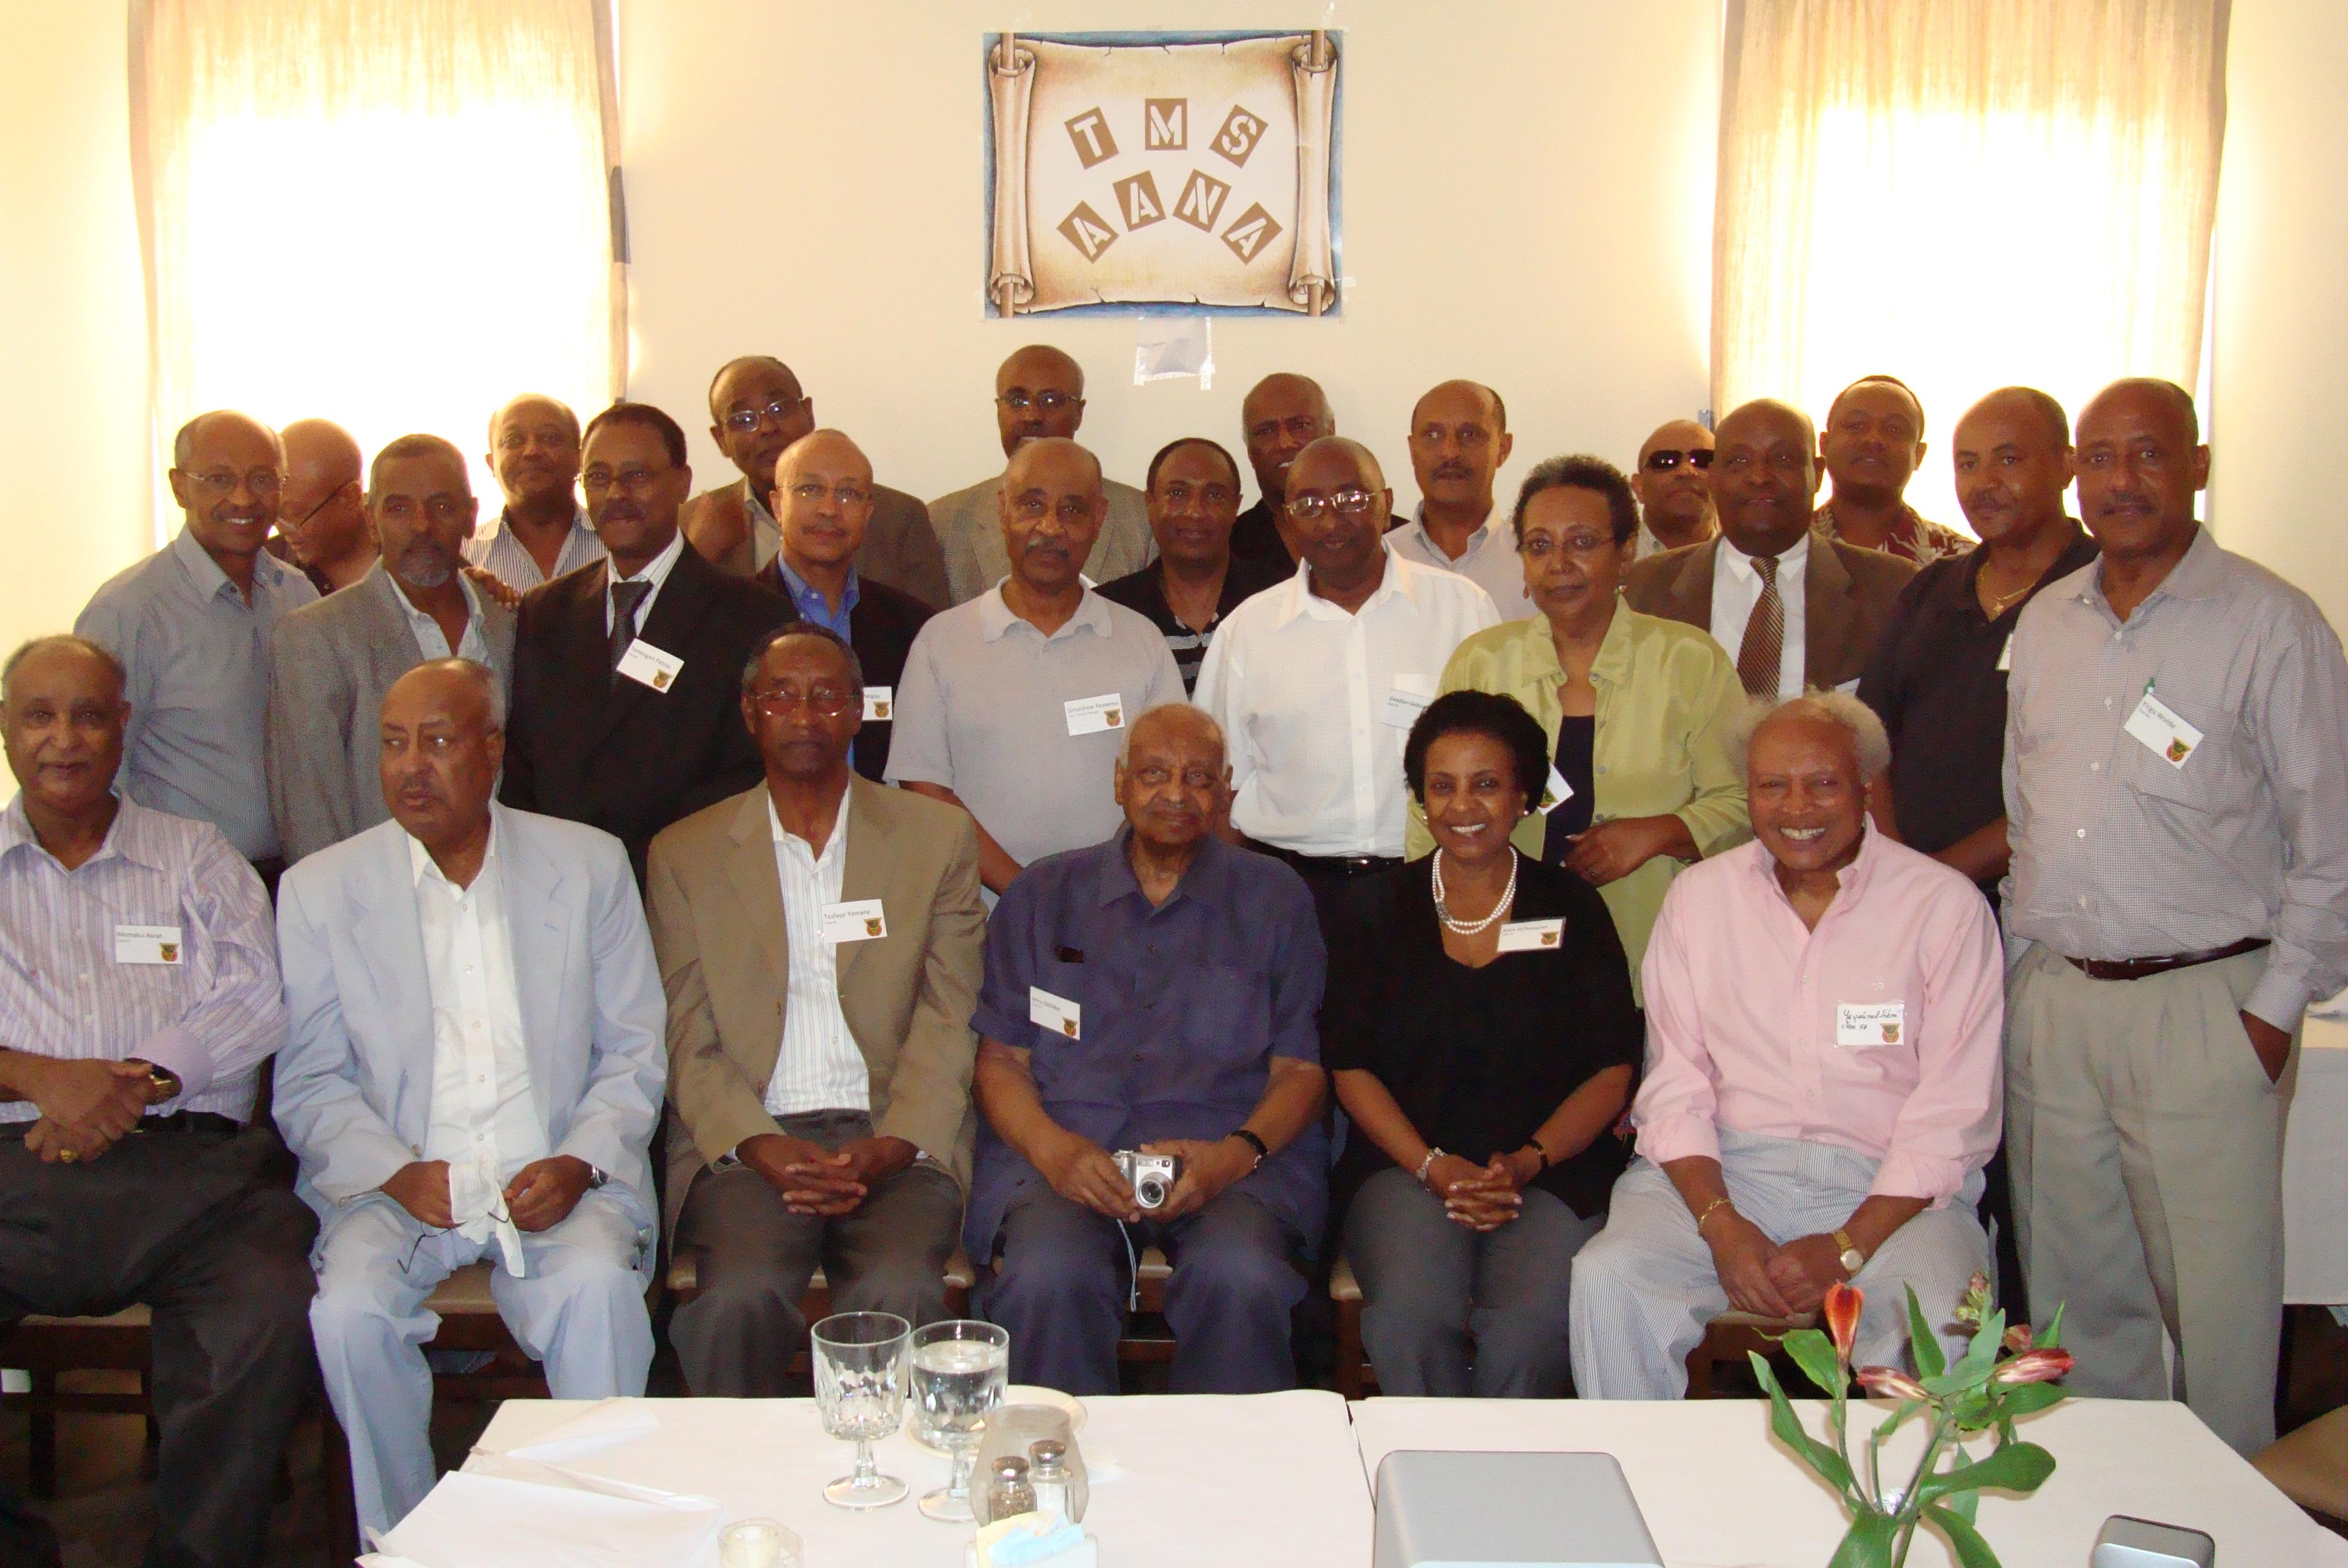 TMSAANA Formation Meeting 2011 DC